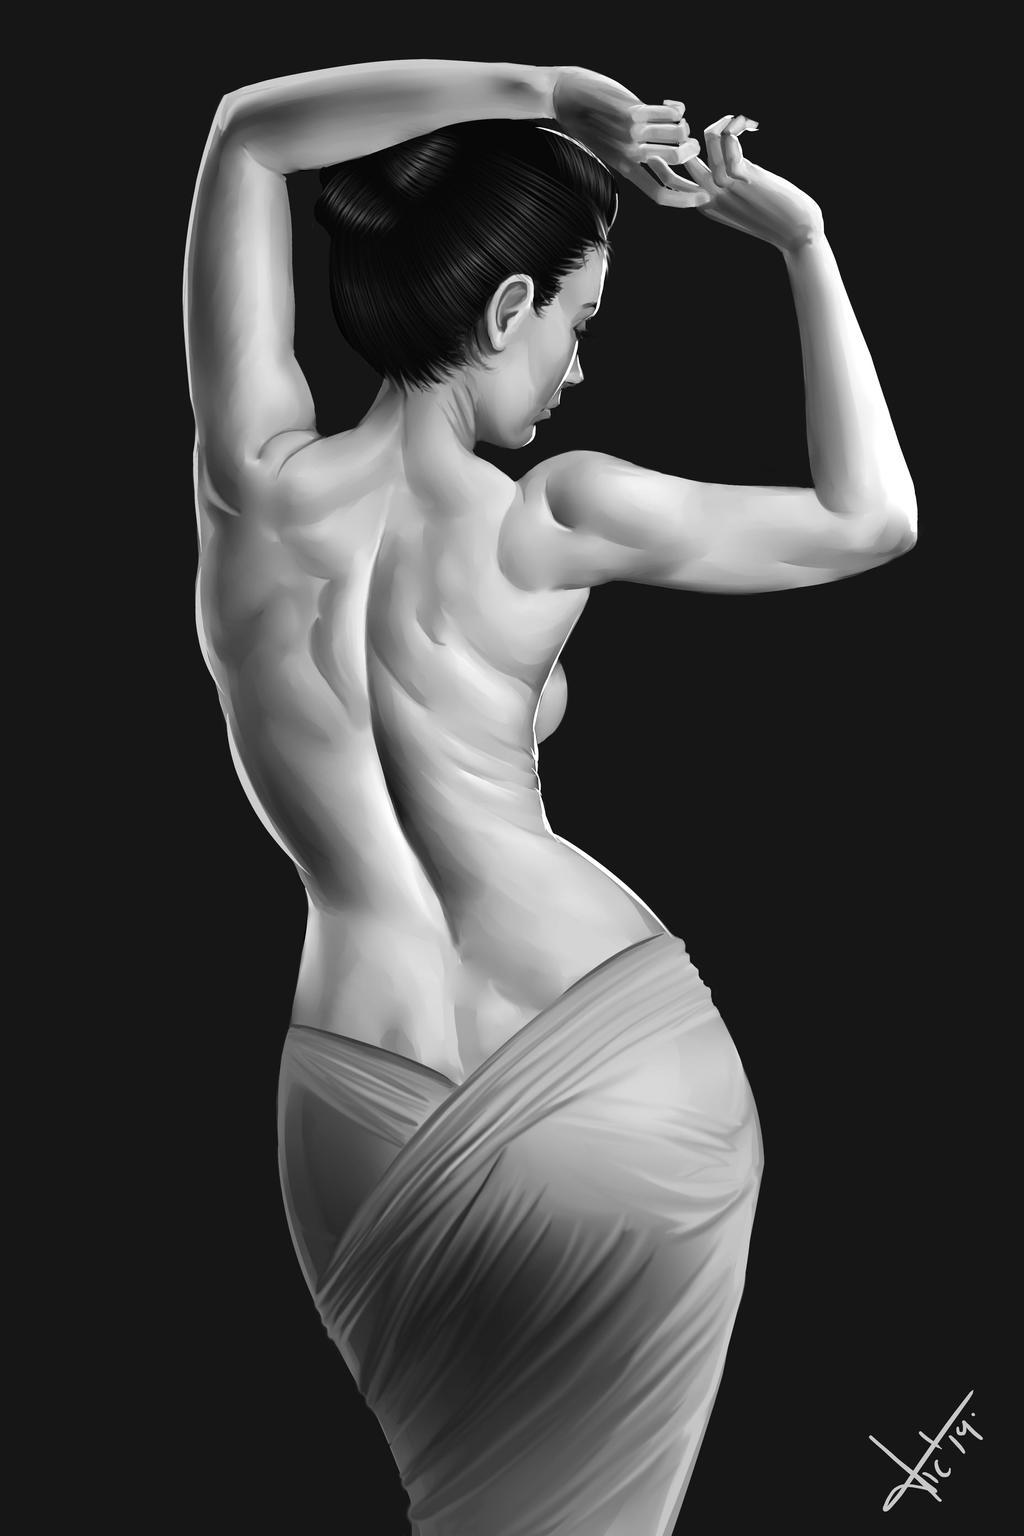 Back Female Anatomy Study by victter-le-fou on DeviantArt